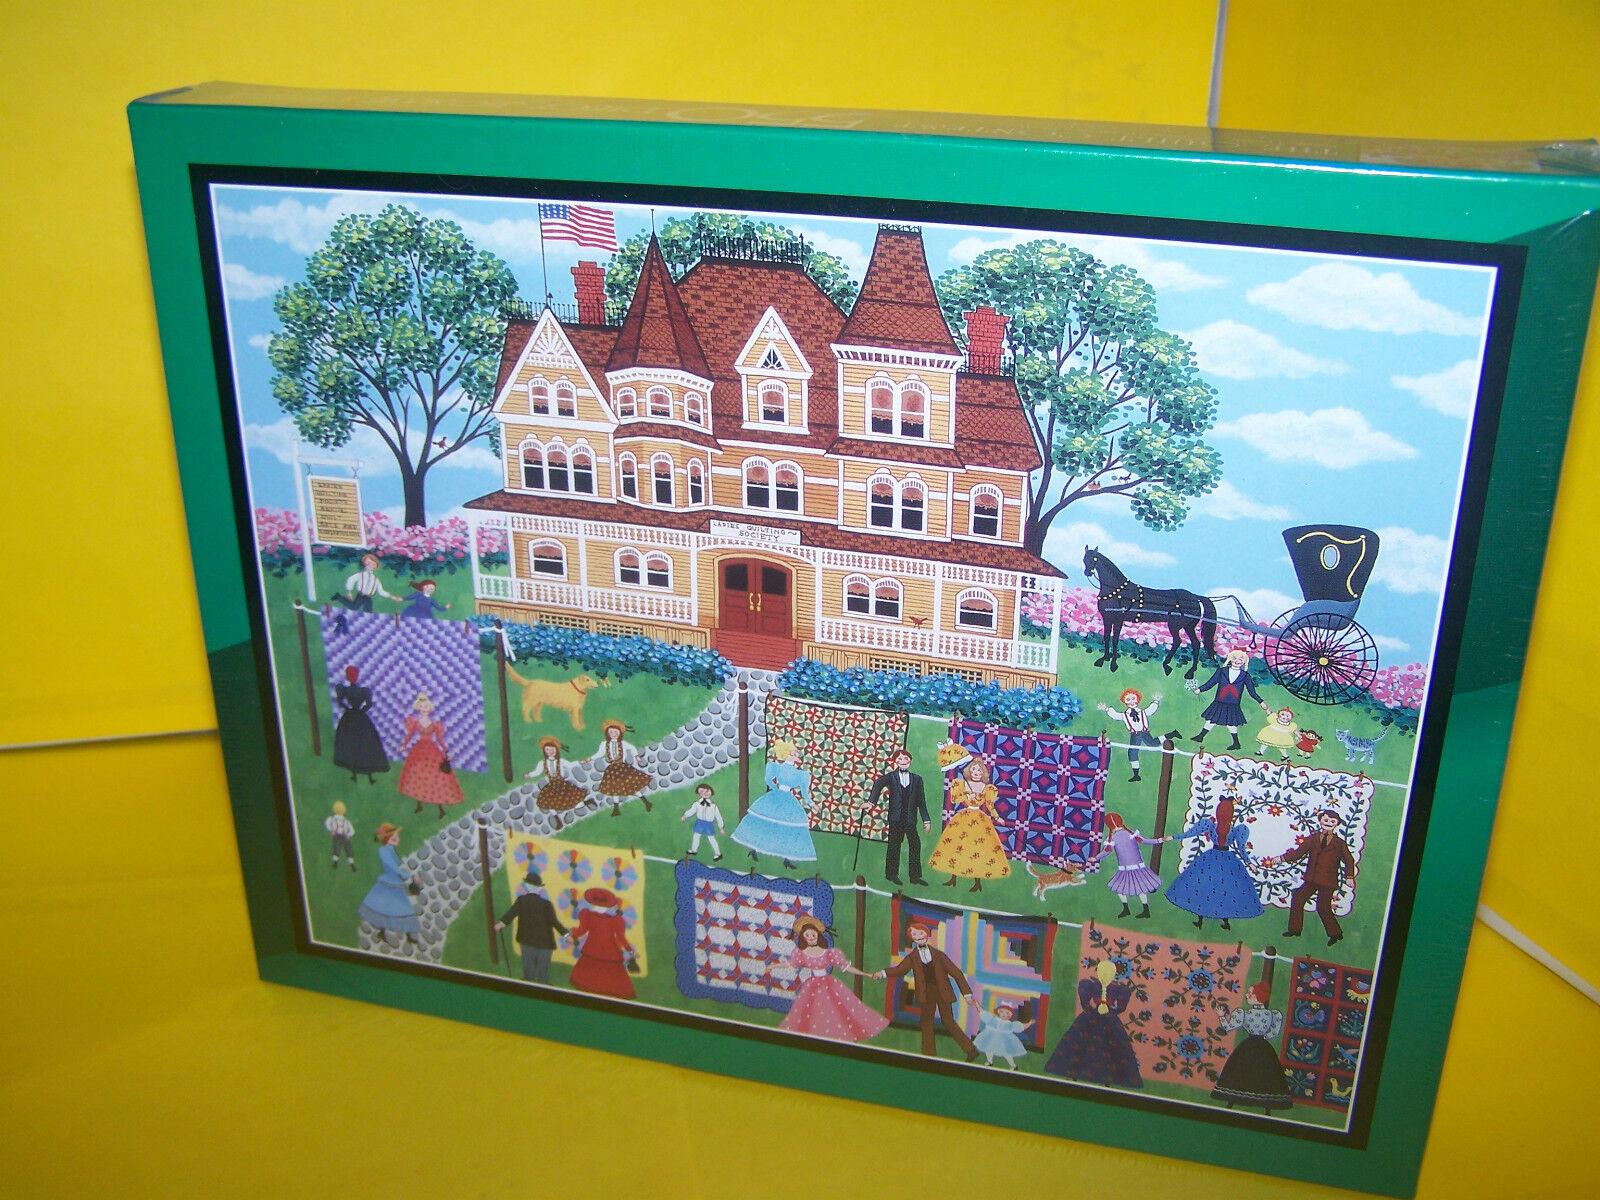 The Quilt Contest 550 Piece Jigsaw Puzzle 18 X 24 - Bits & Pieces   eBay